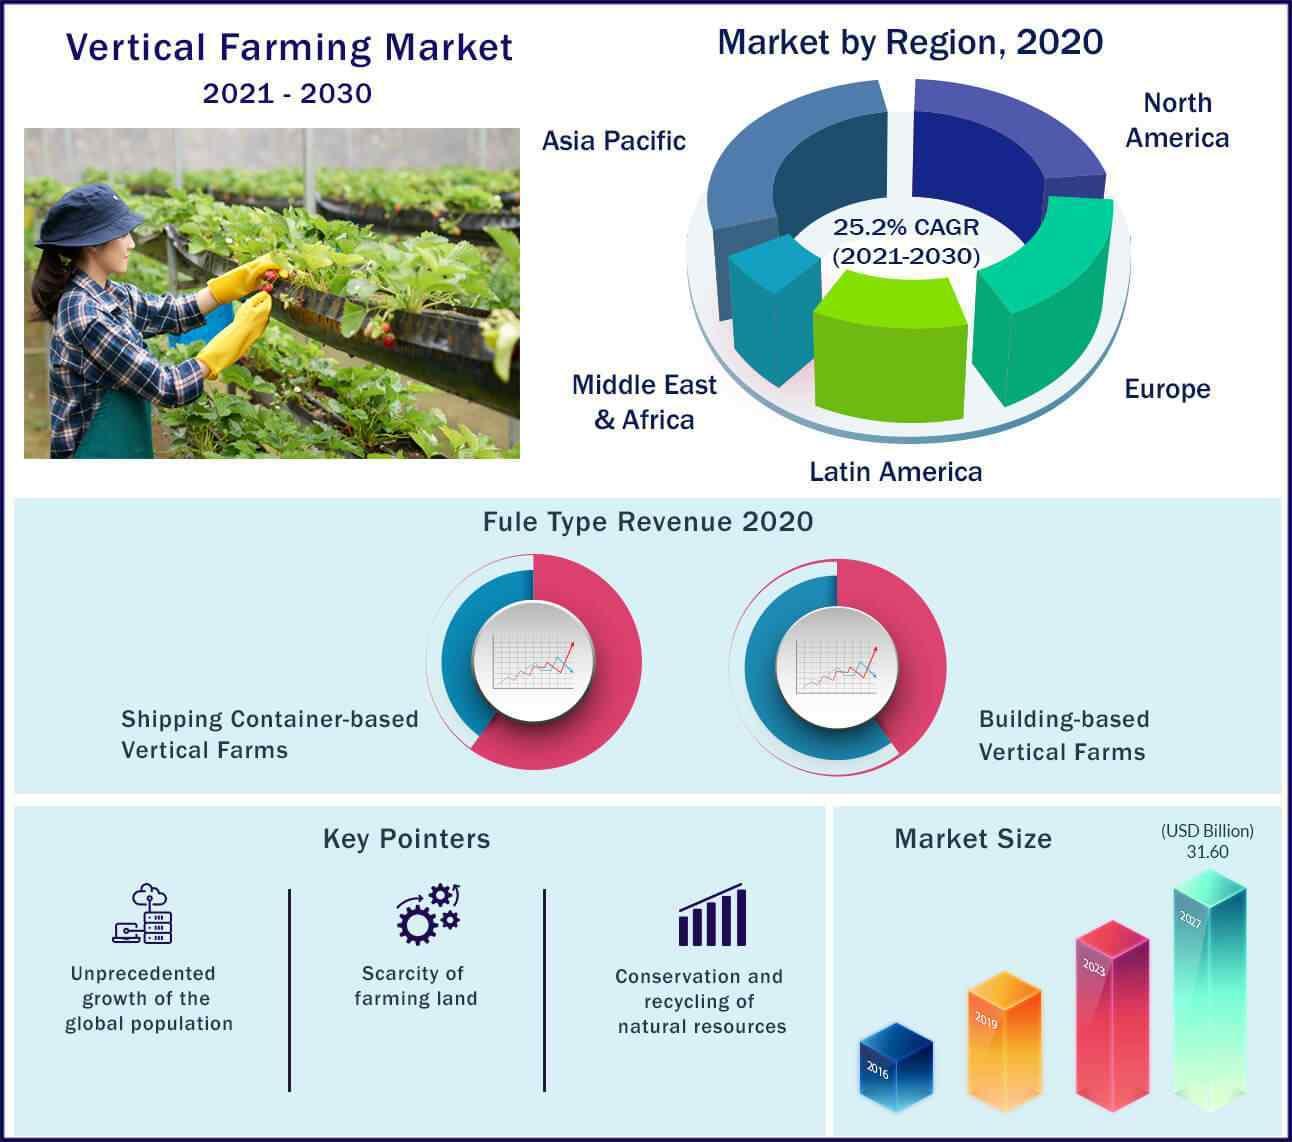 Global Vertical Farming Market 2021-2030